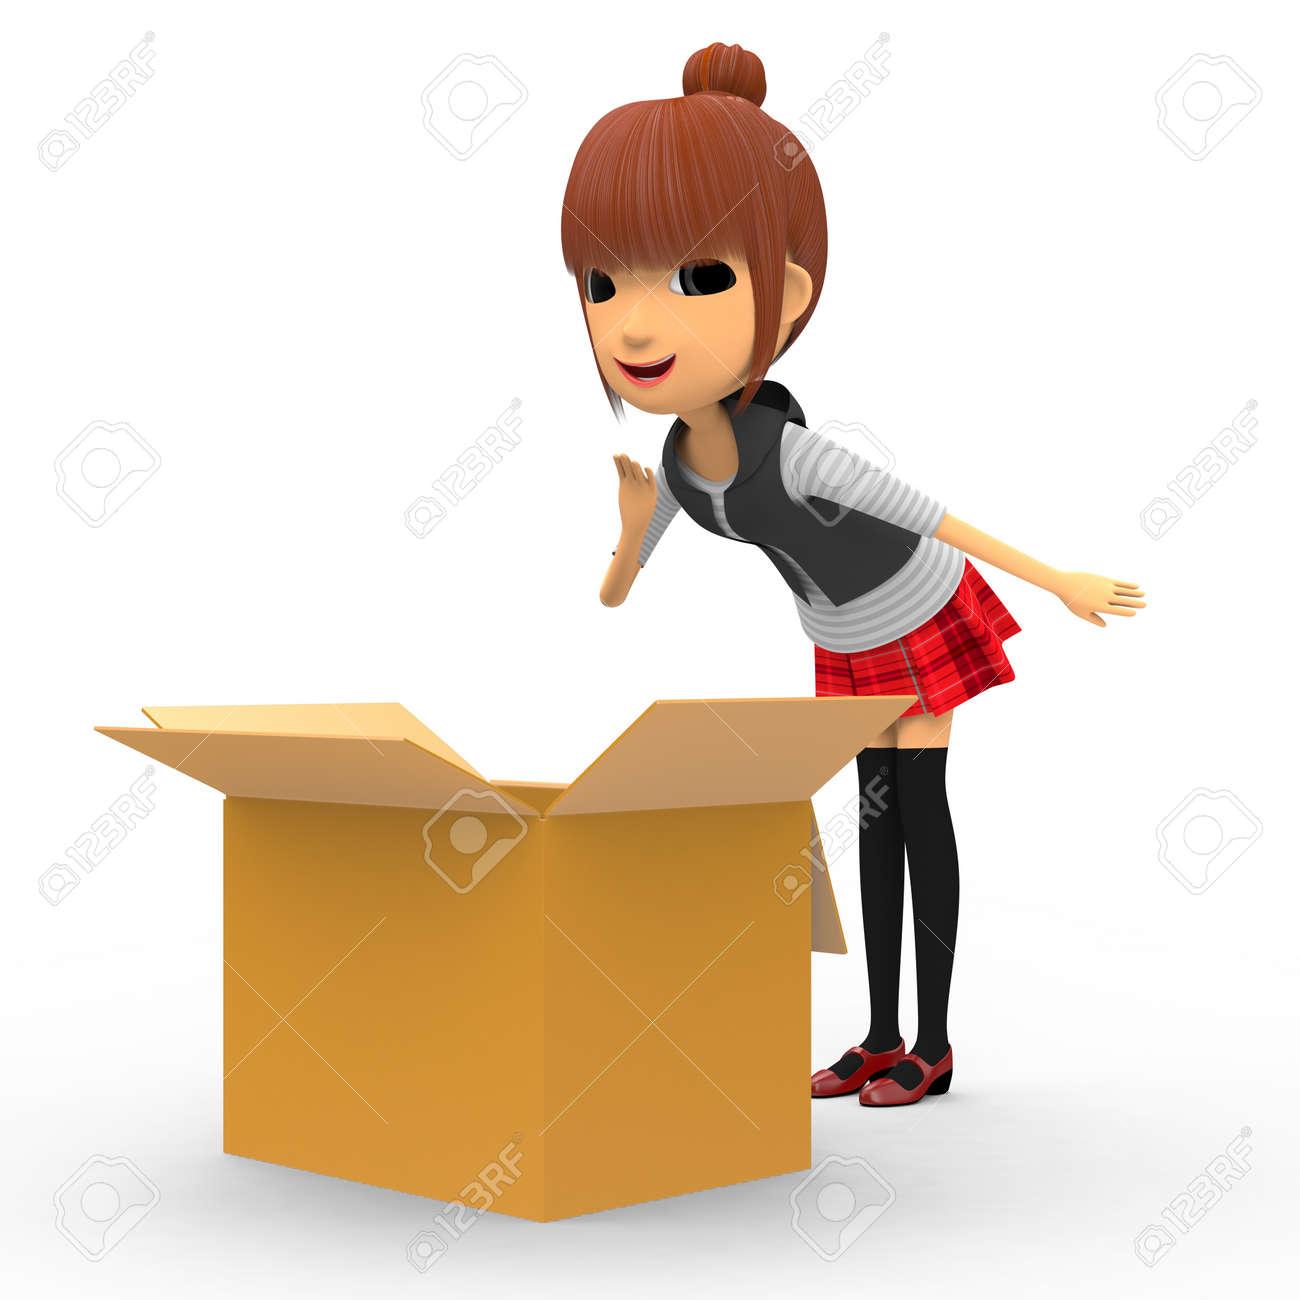 Looking in a cardboard box. Stock Photo - 18704975